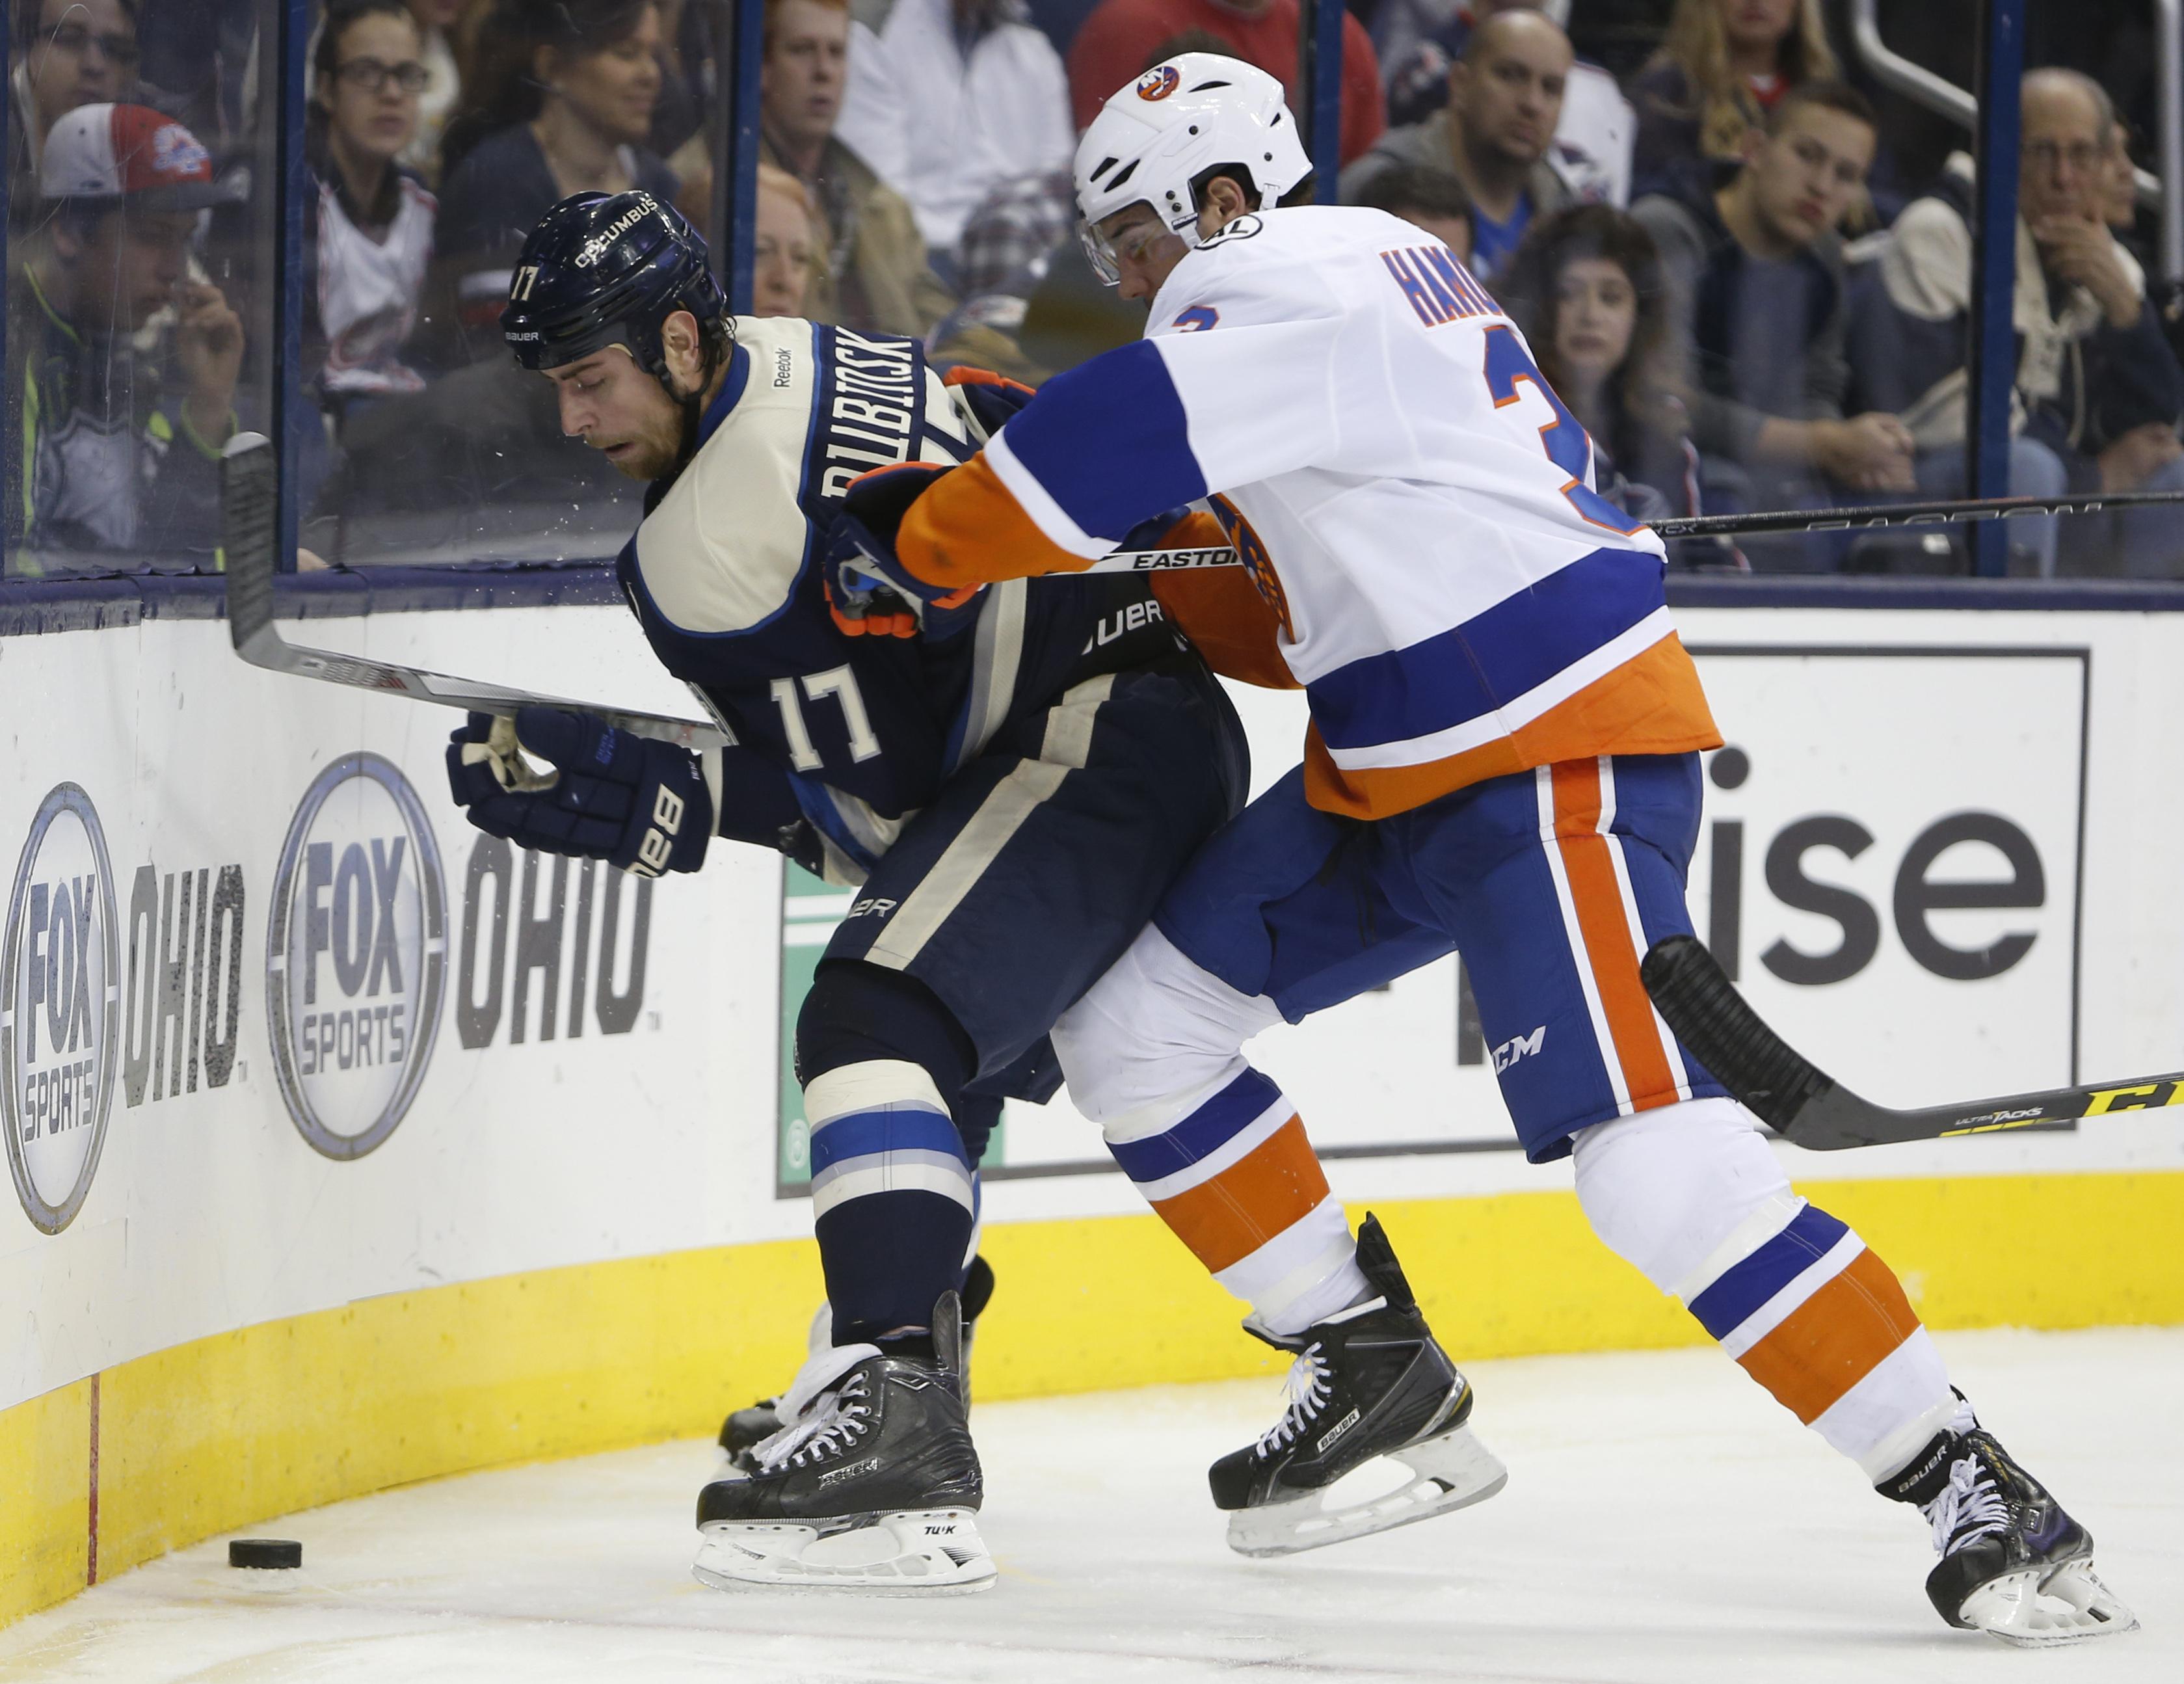 New York Islanders' Travis Hamonic, right, checks Columbus Blue Jackets' Brandon Dubinsky during the second period of an NHL hockey game Saturday, Dec. 12, 2015, in Columbus, Ohio. The Islanders beat the Blue Jackets 3-2 in overtime. (AP Photo/Jay LaPrete